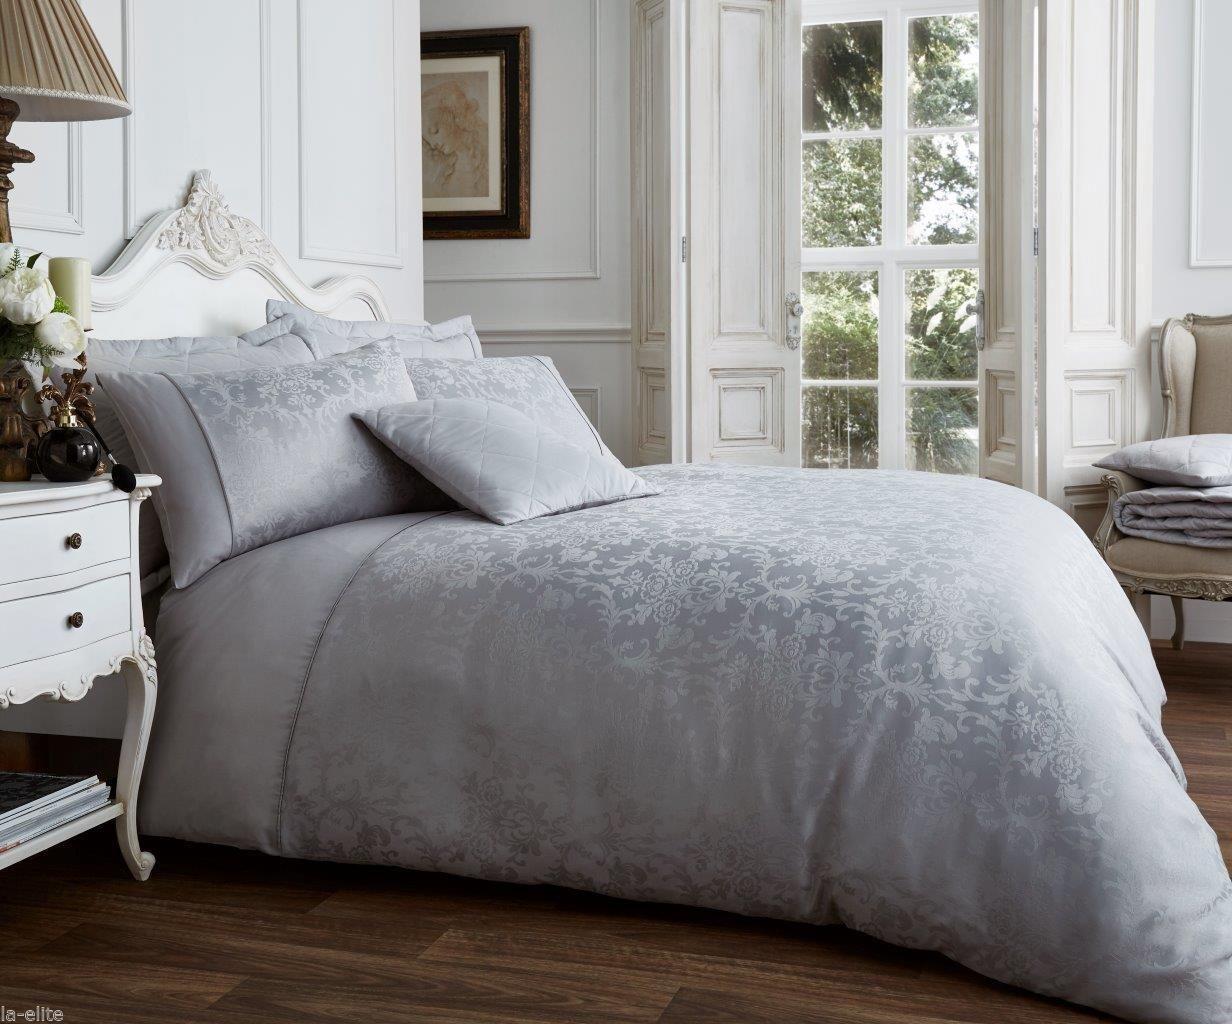 Details About Luxury Duvet Cover Set King Size Double Single Super Designer Bedding New Quilt Bed Duvet Covers Duvet Cover Sets Duvet Covers